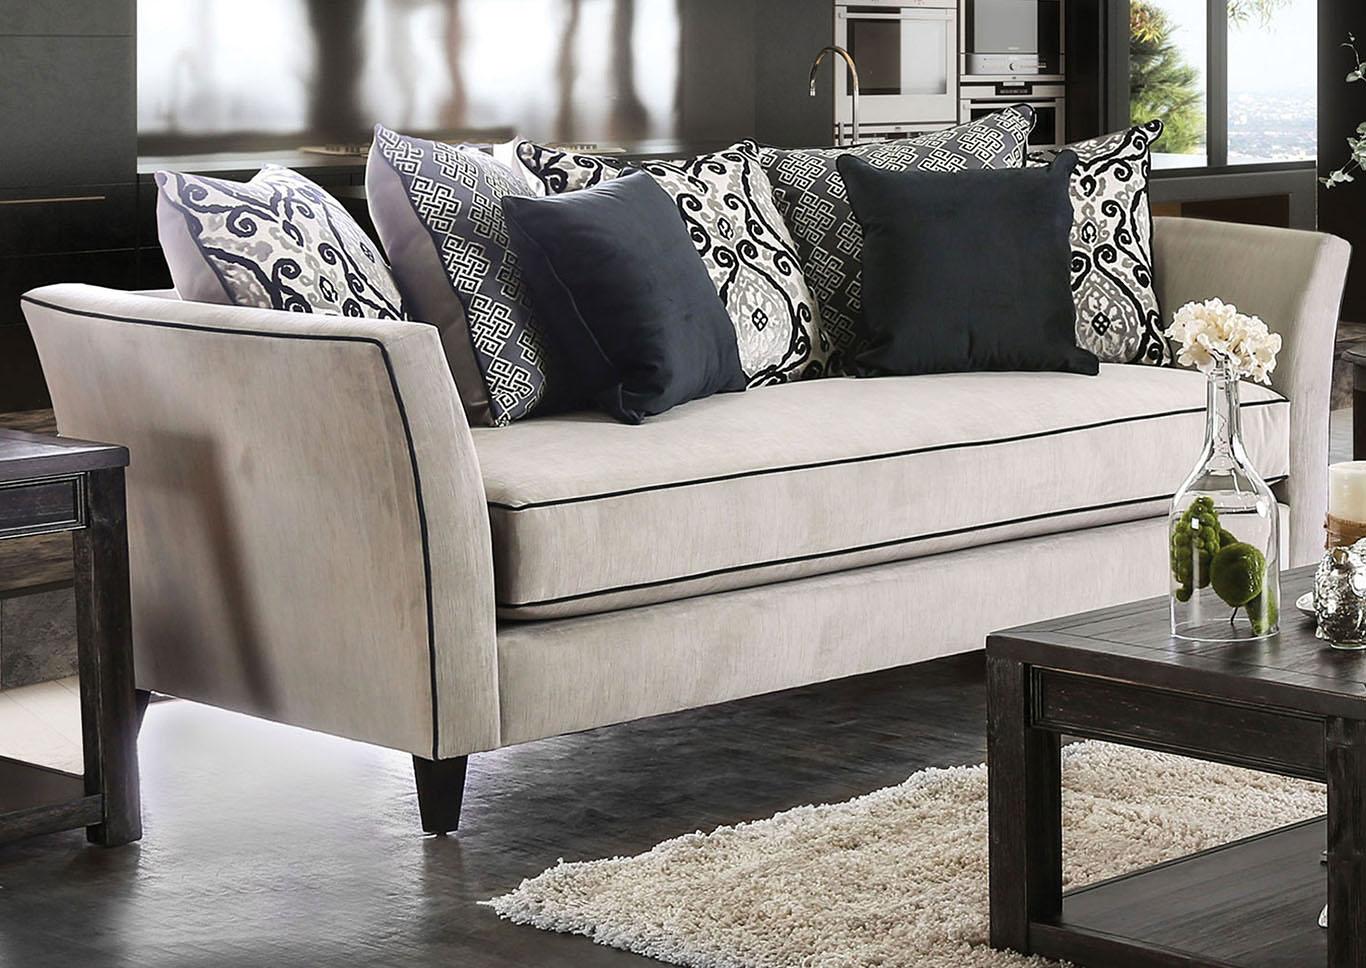 Bronx, NY Home Furniture Store